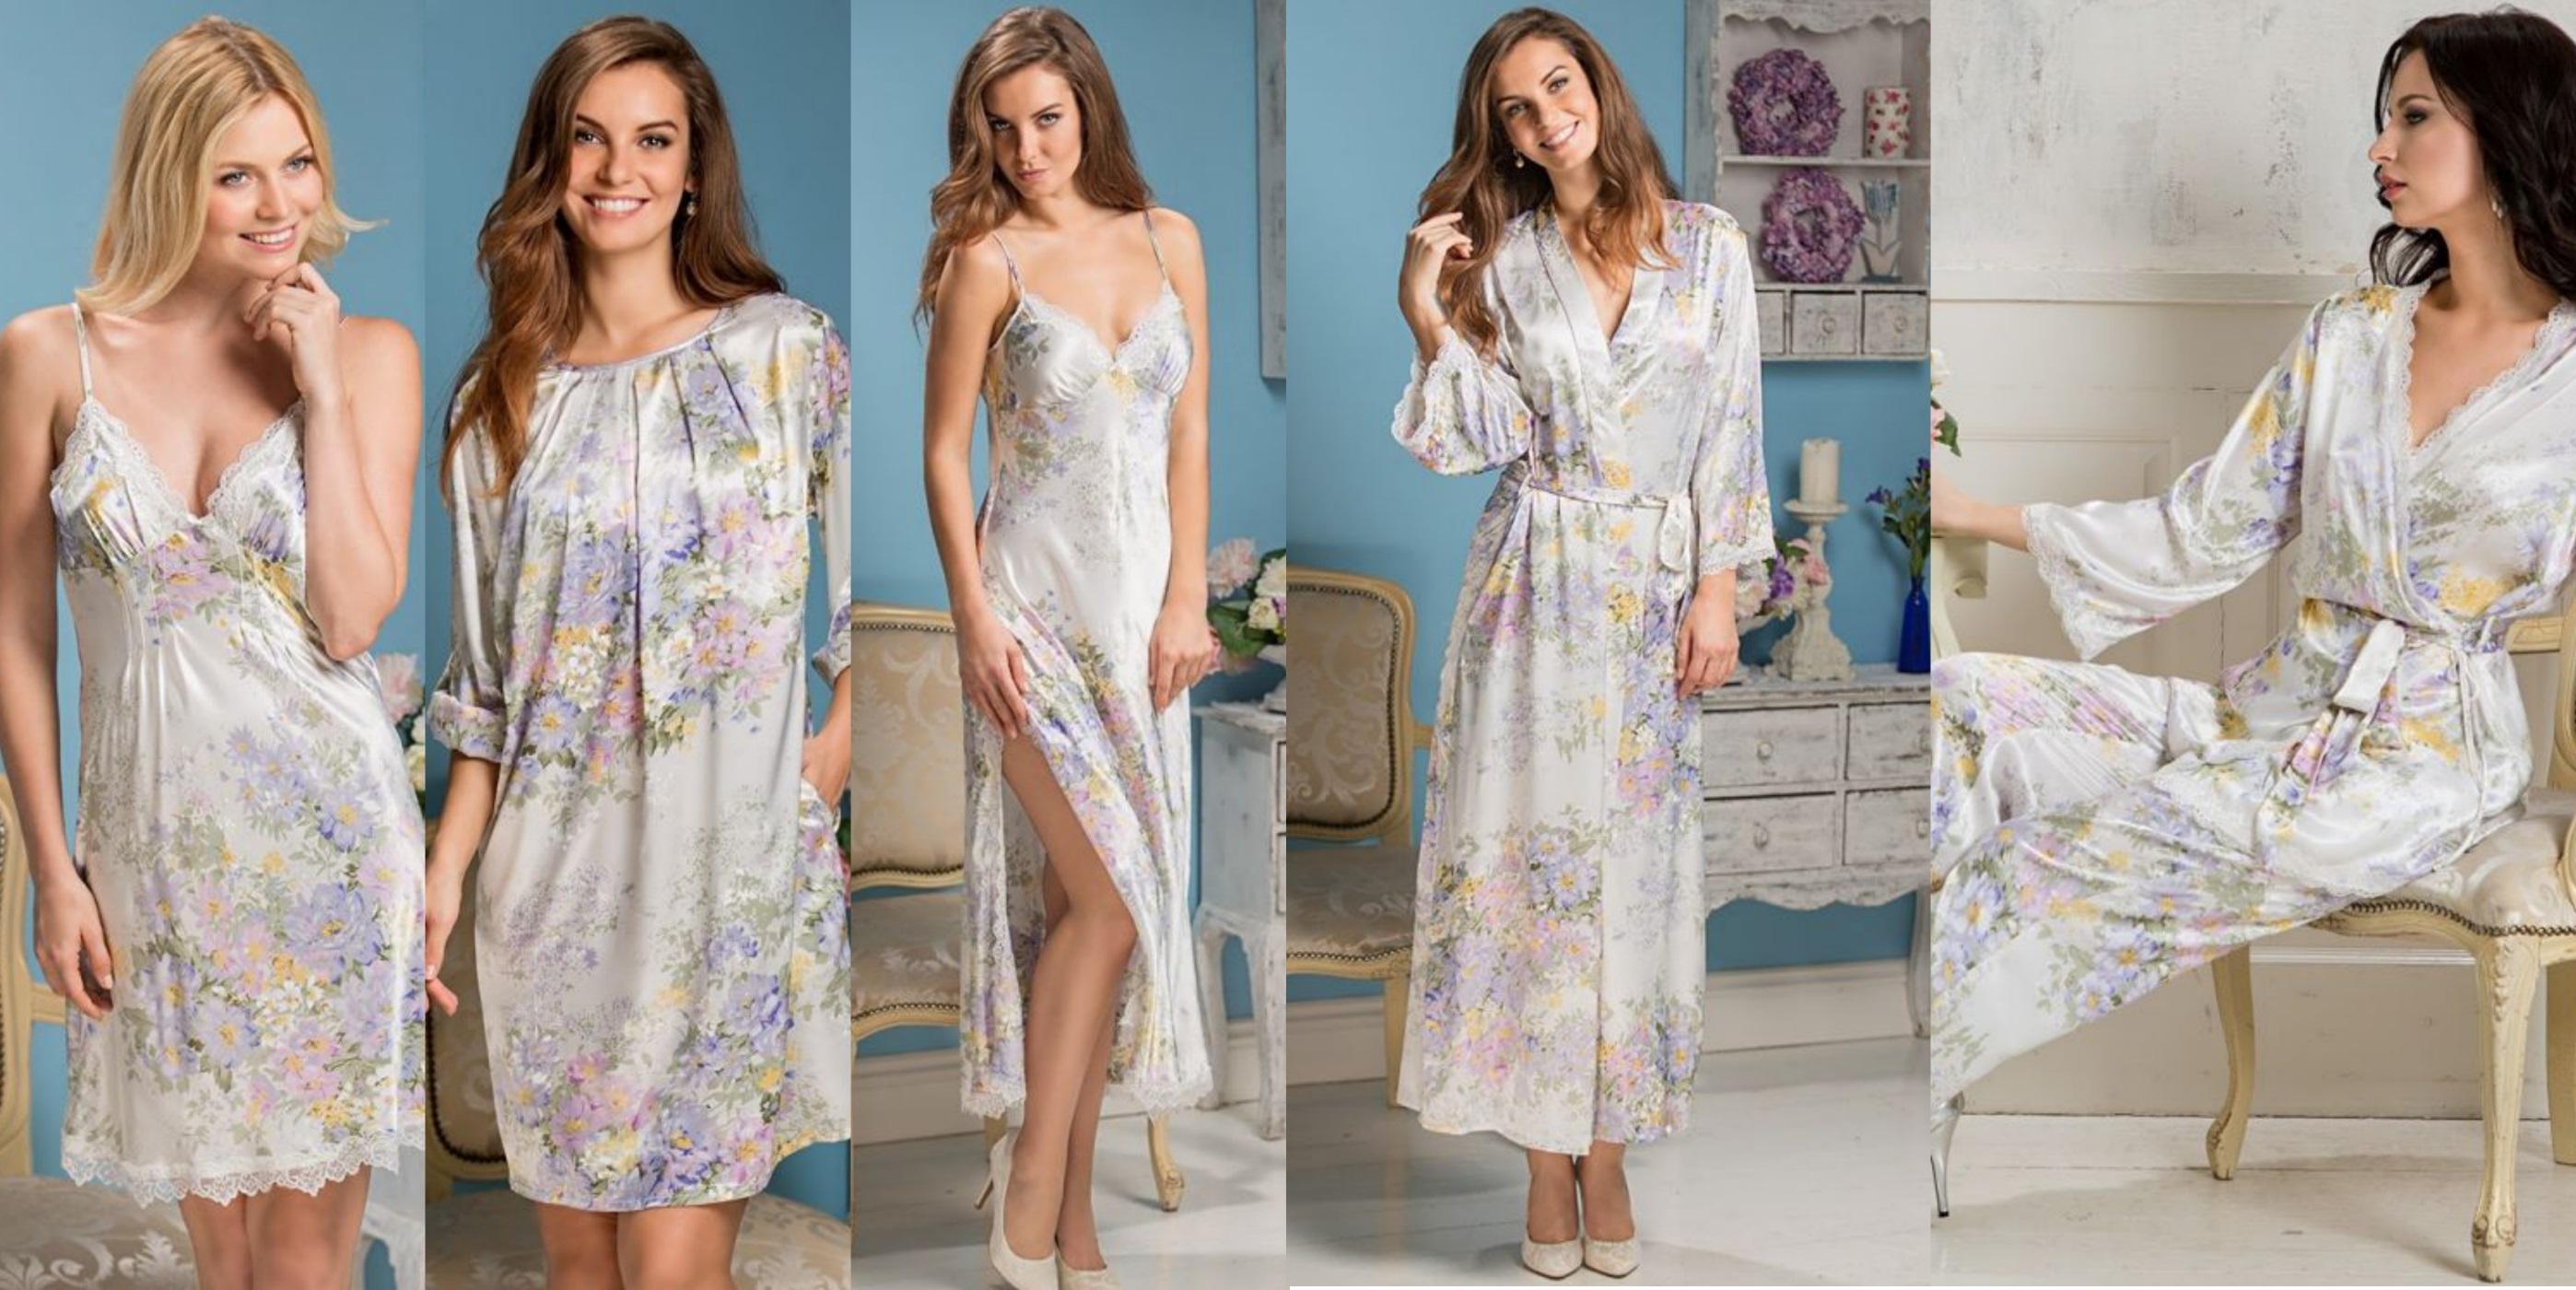 Пижамы, халаты, сорочки Lilianna Mia-Mia купить